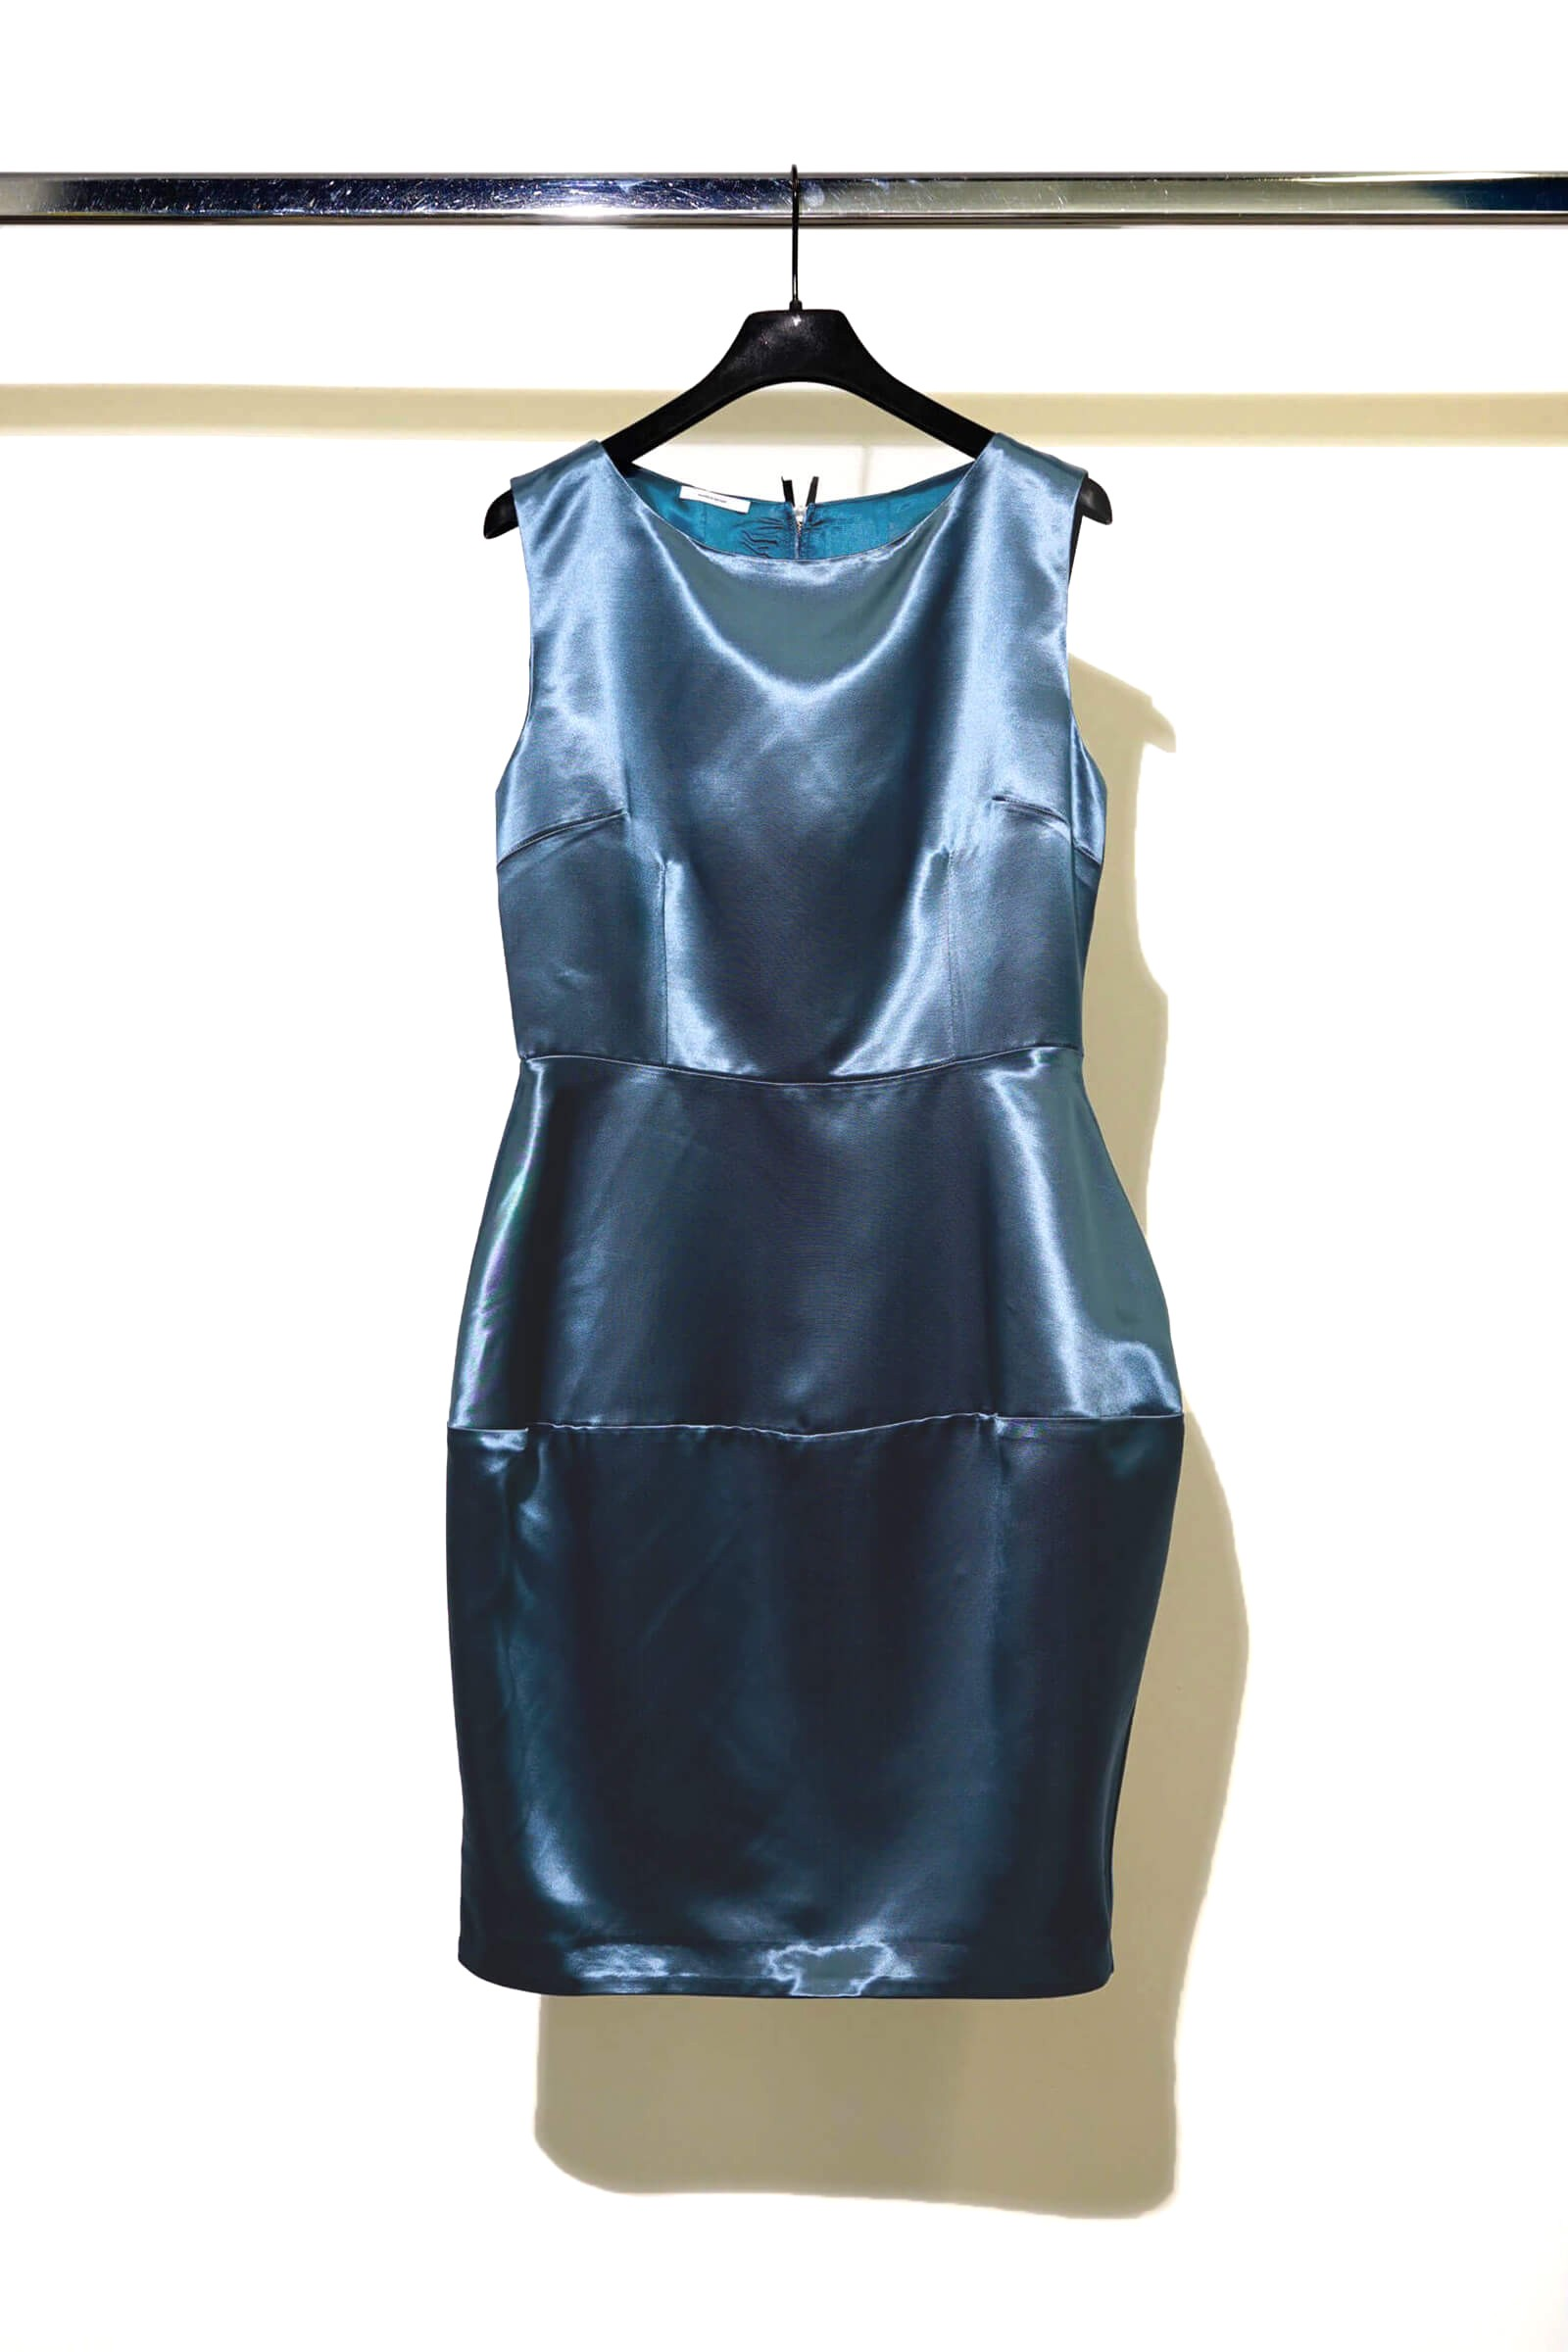 Rochie lucioasa albastra...